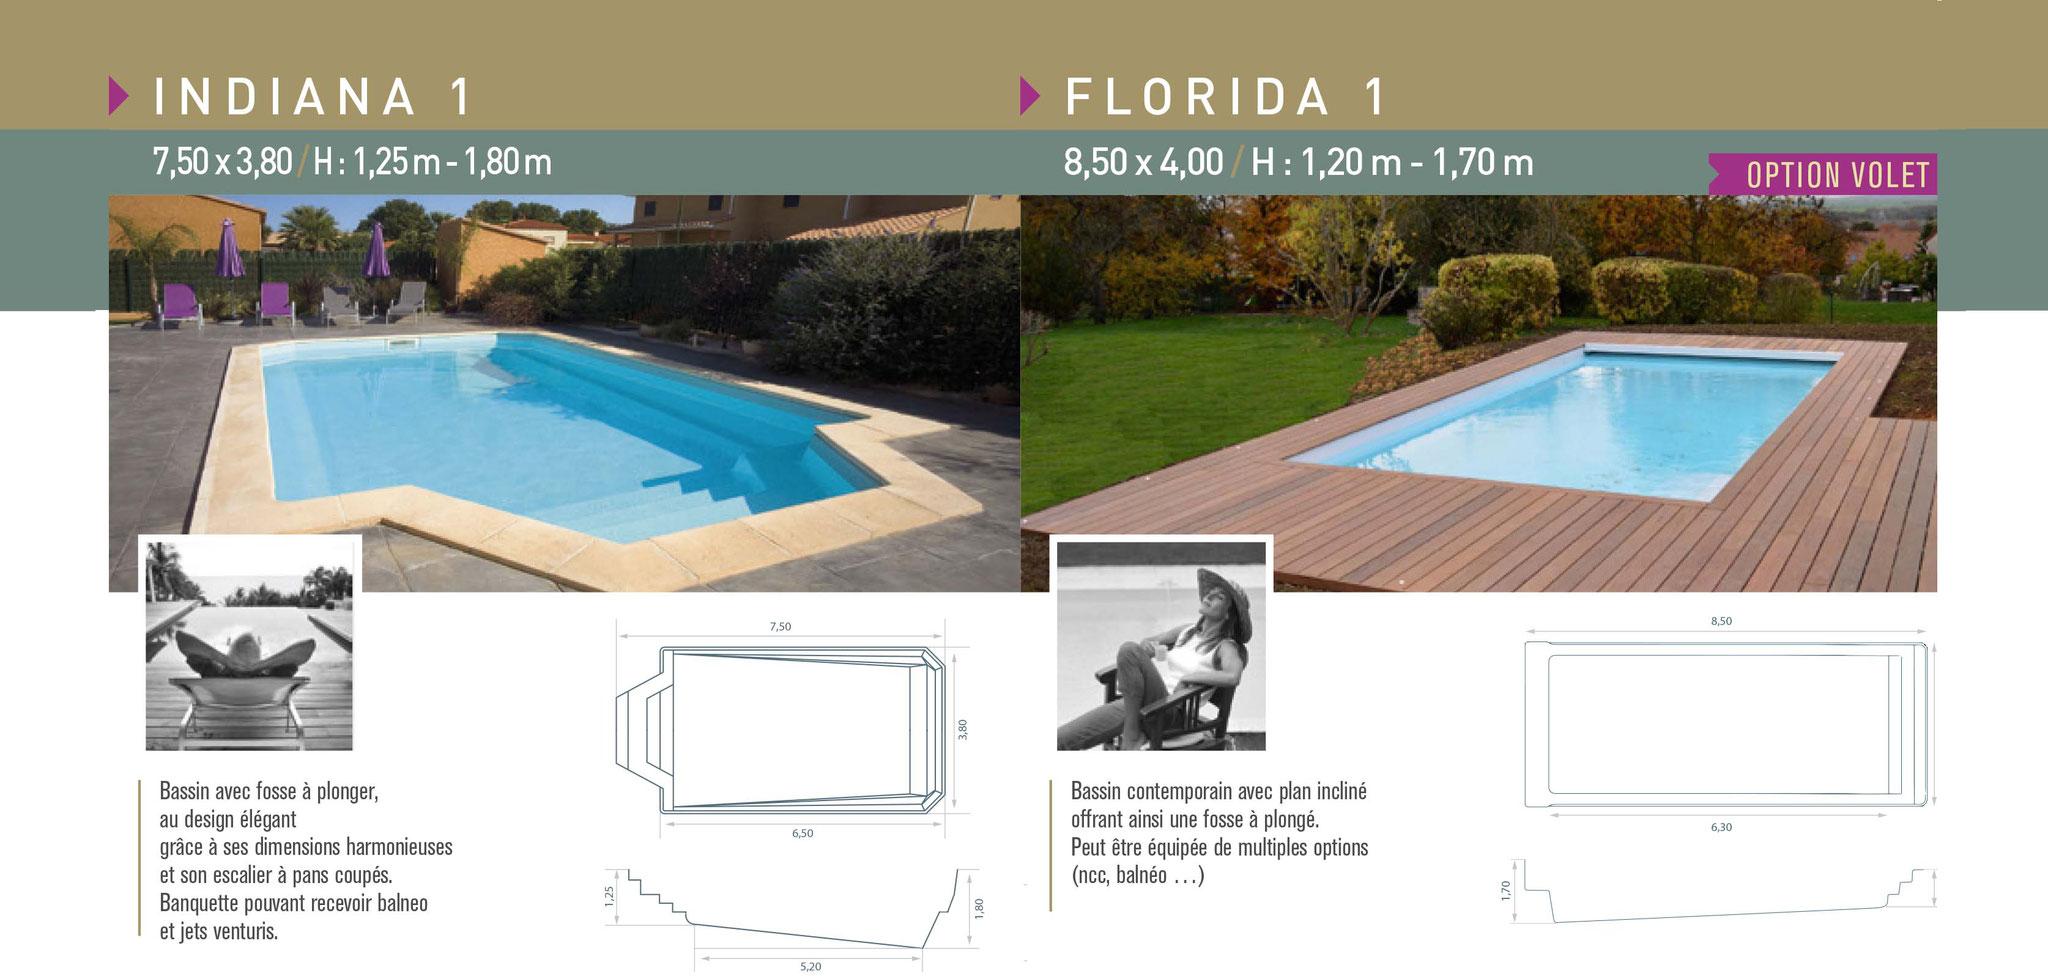 Nos meilleurs ventes de bassins en fond pente : piscines IBIZA Florida 1 et Indiana 1